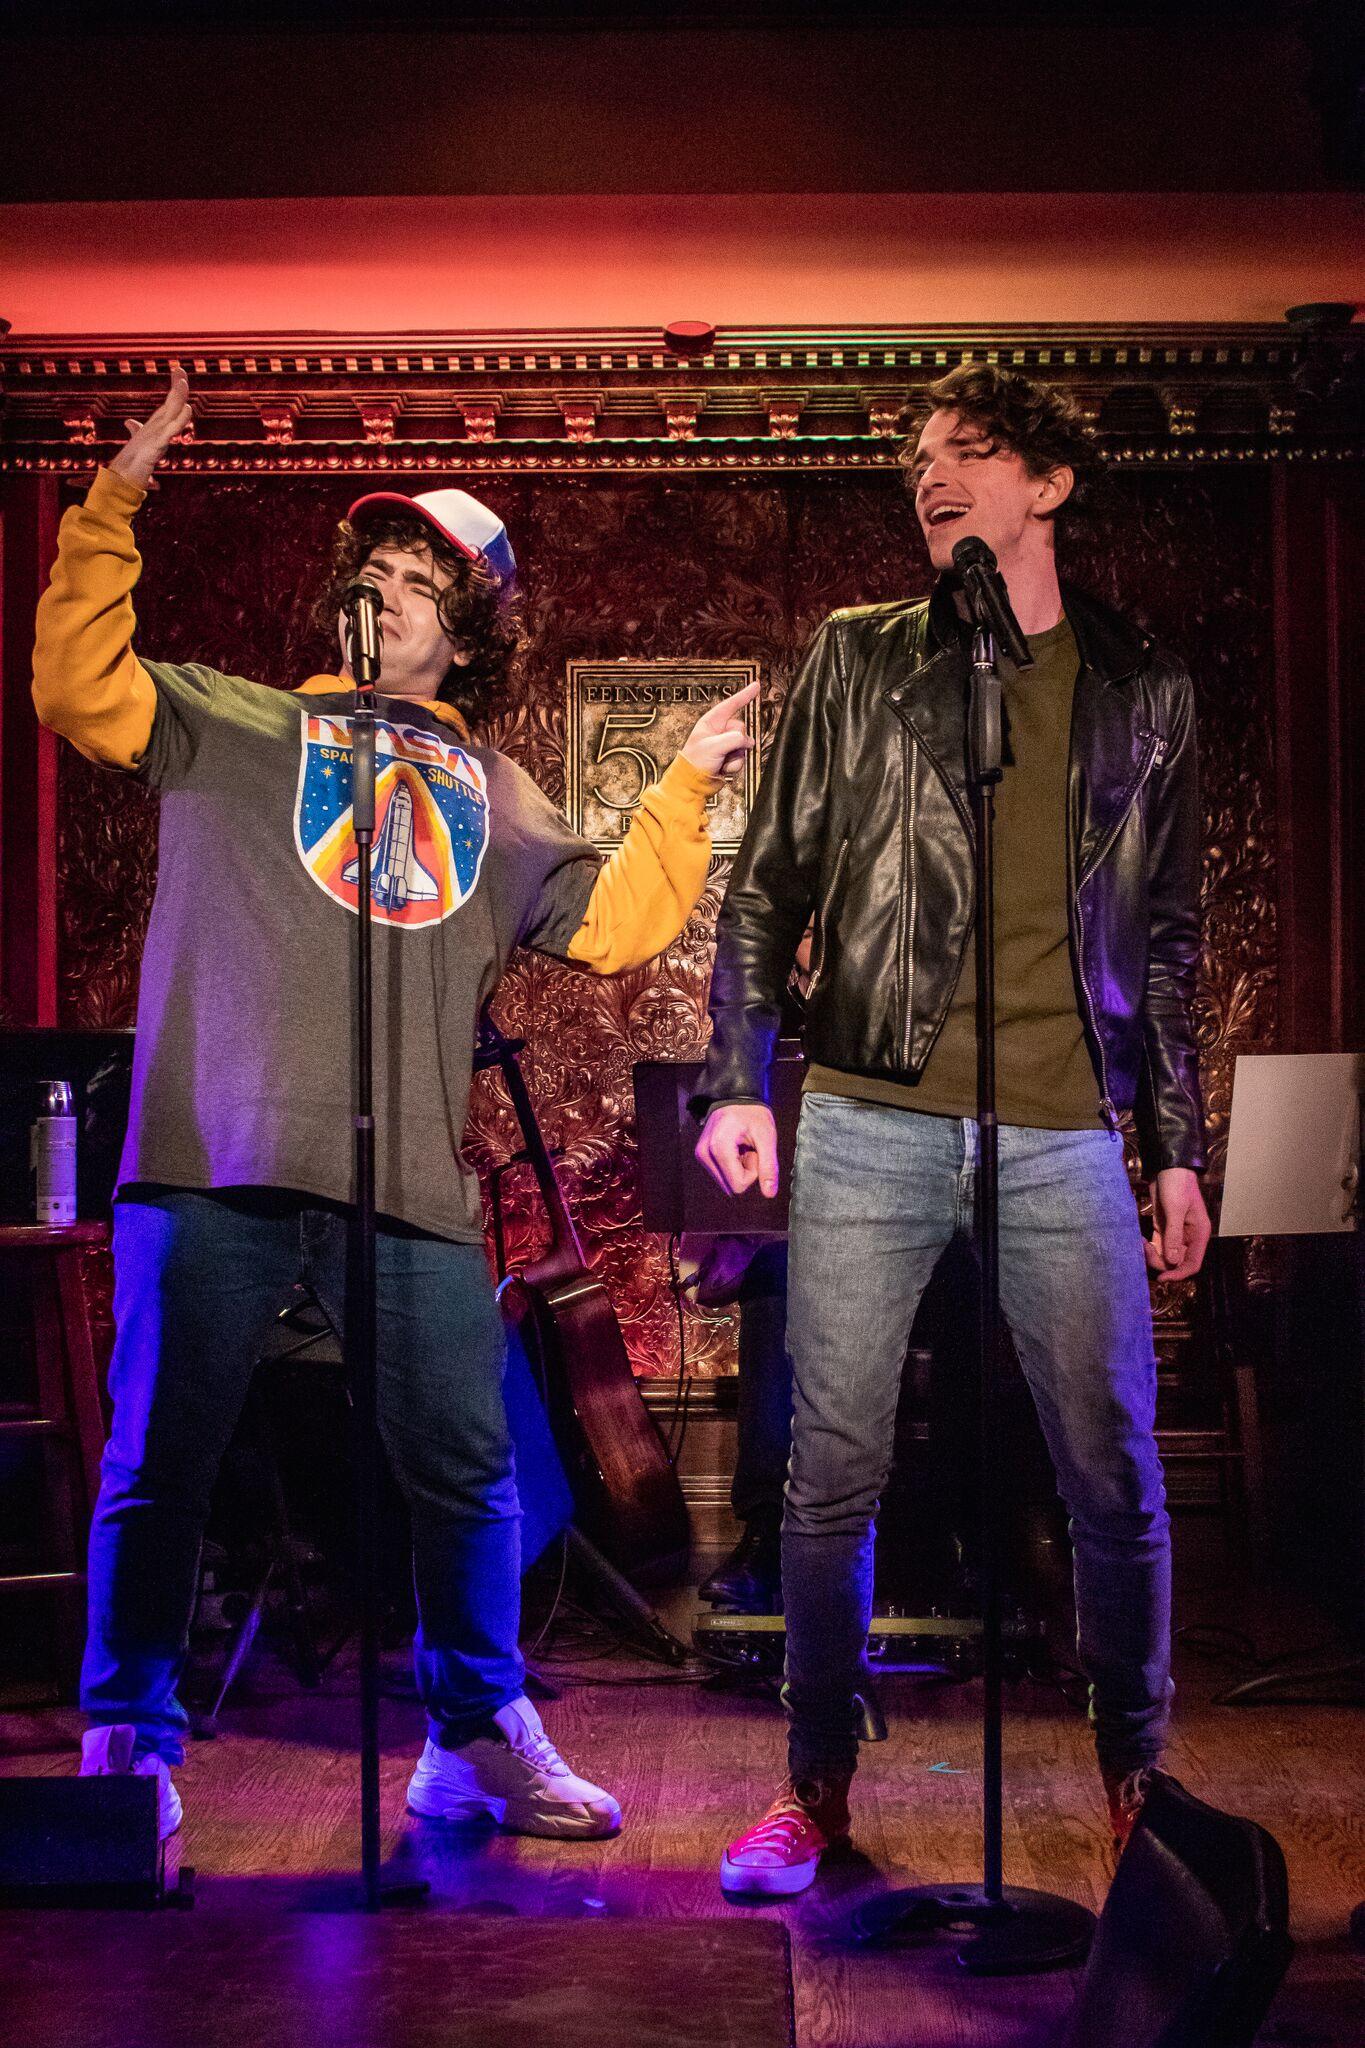 Stranger Sings: An Unauthorized Parody Musica l at Feinstein's/54 Below (2018)